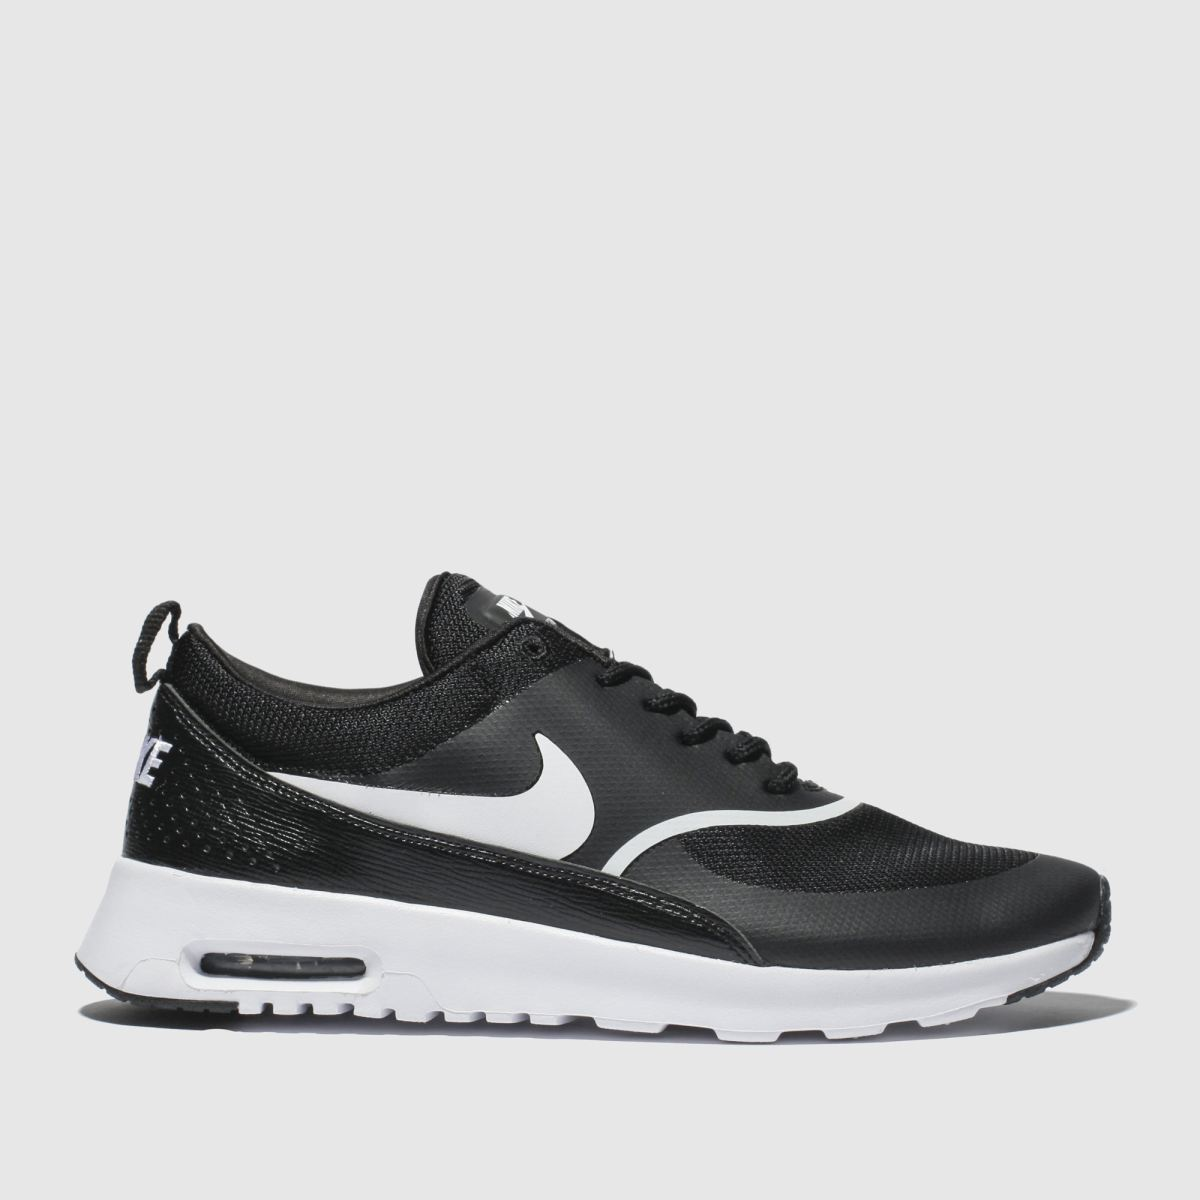 Nike Nike Black & White Air Max Thea Trainers